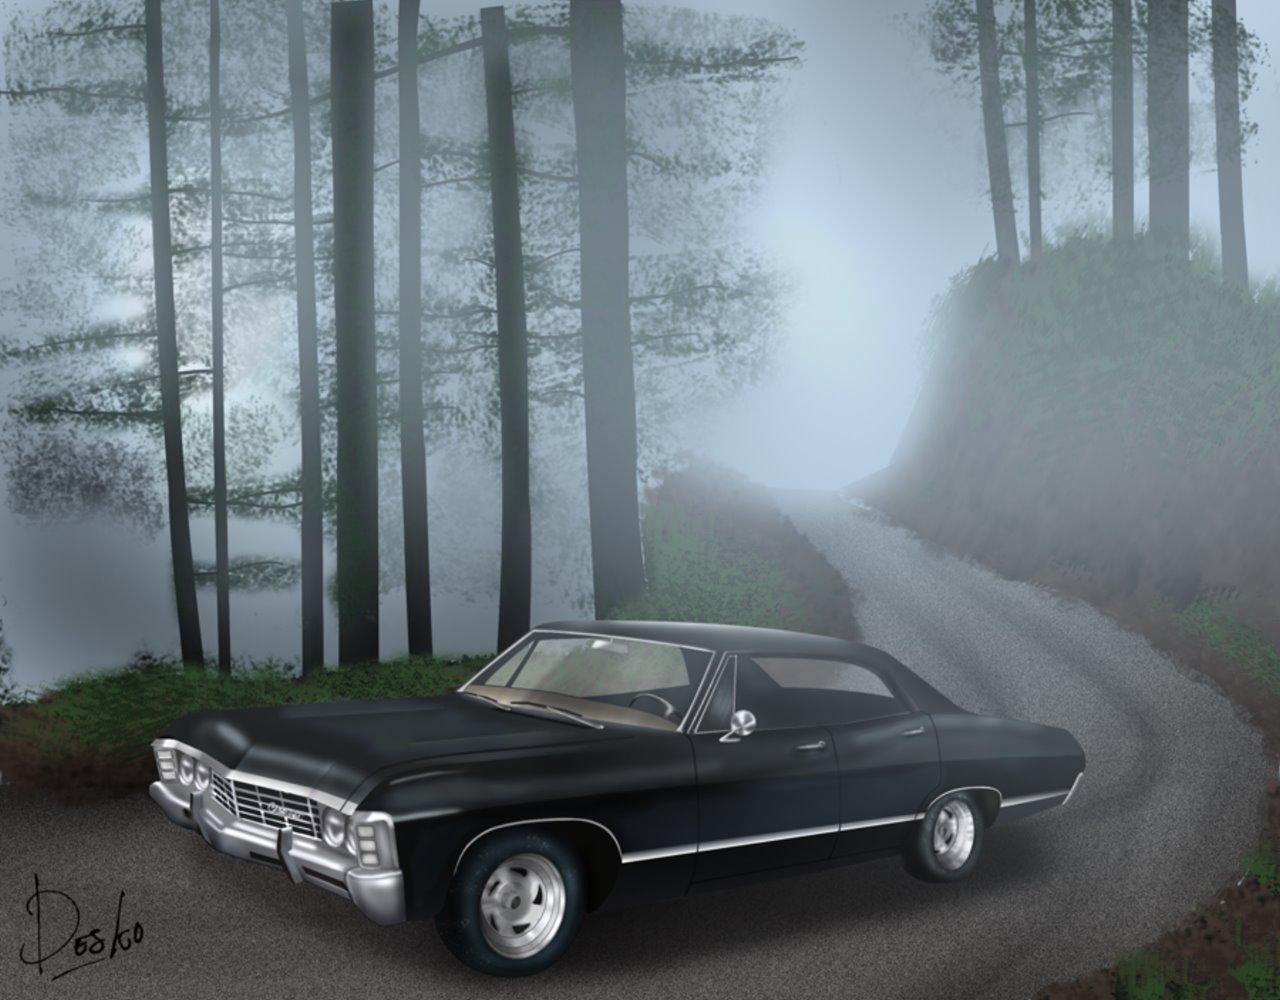 Supernatural Wallpaper Celular Supernatural The Animation Impala